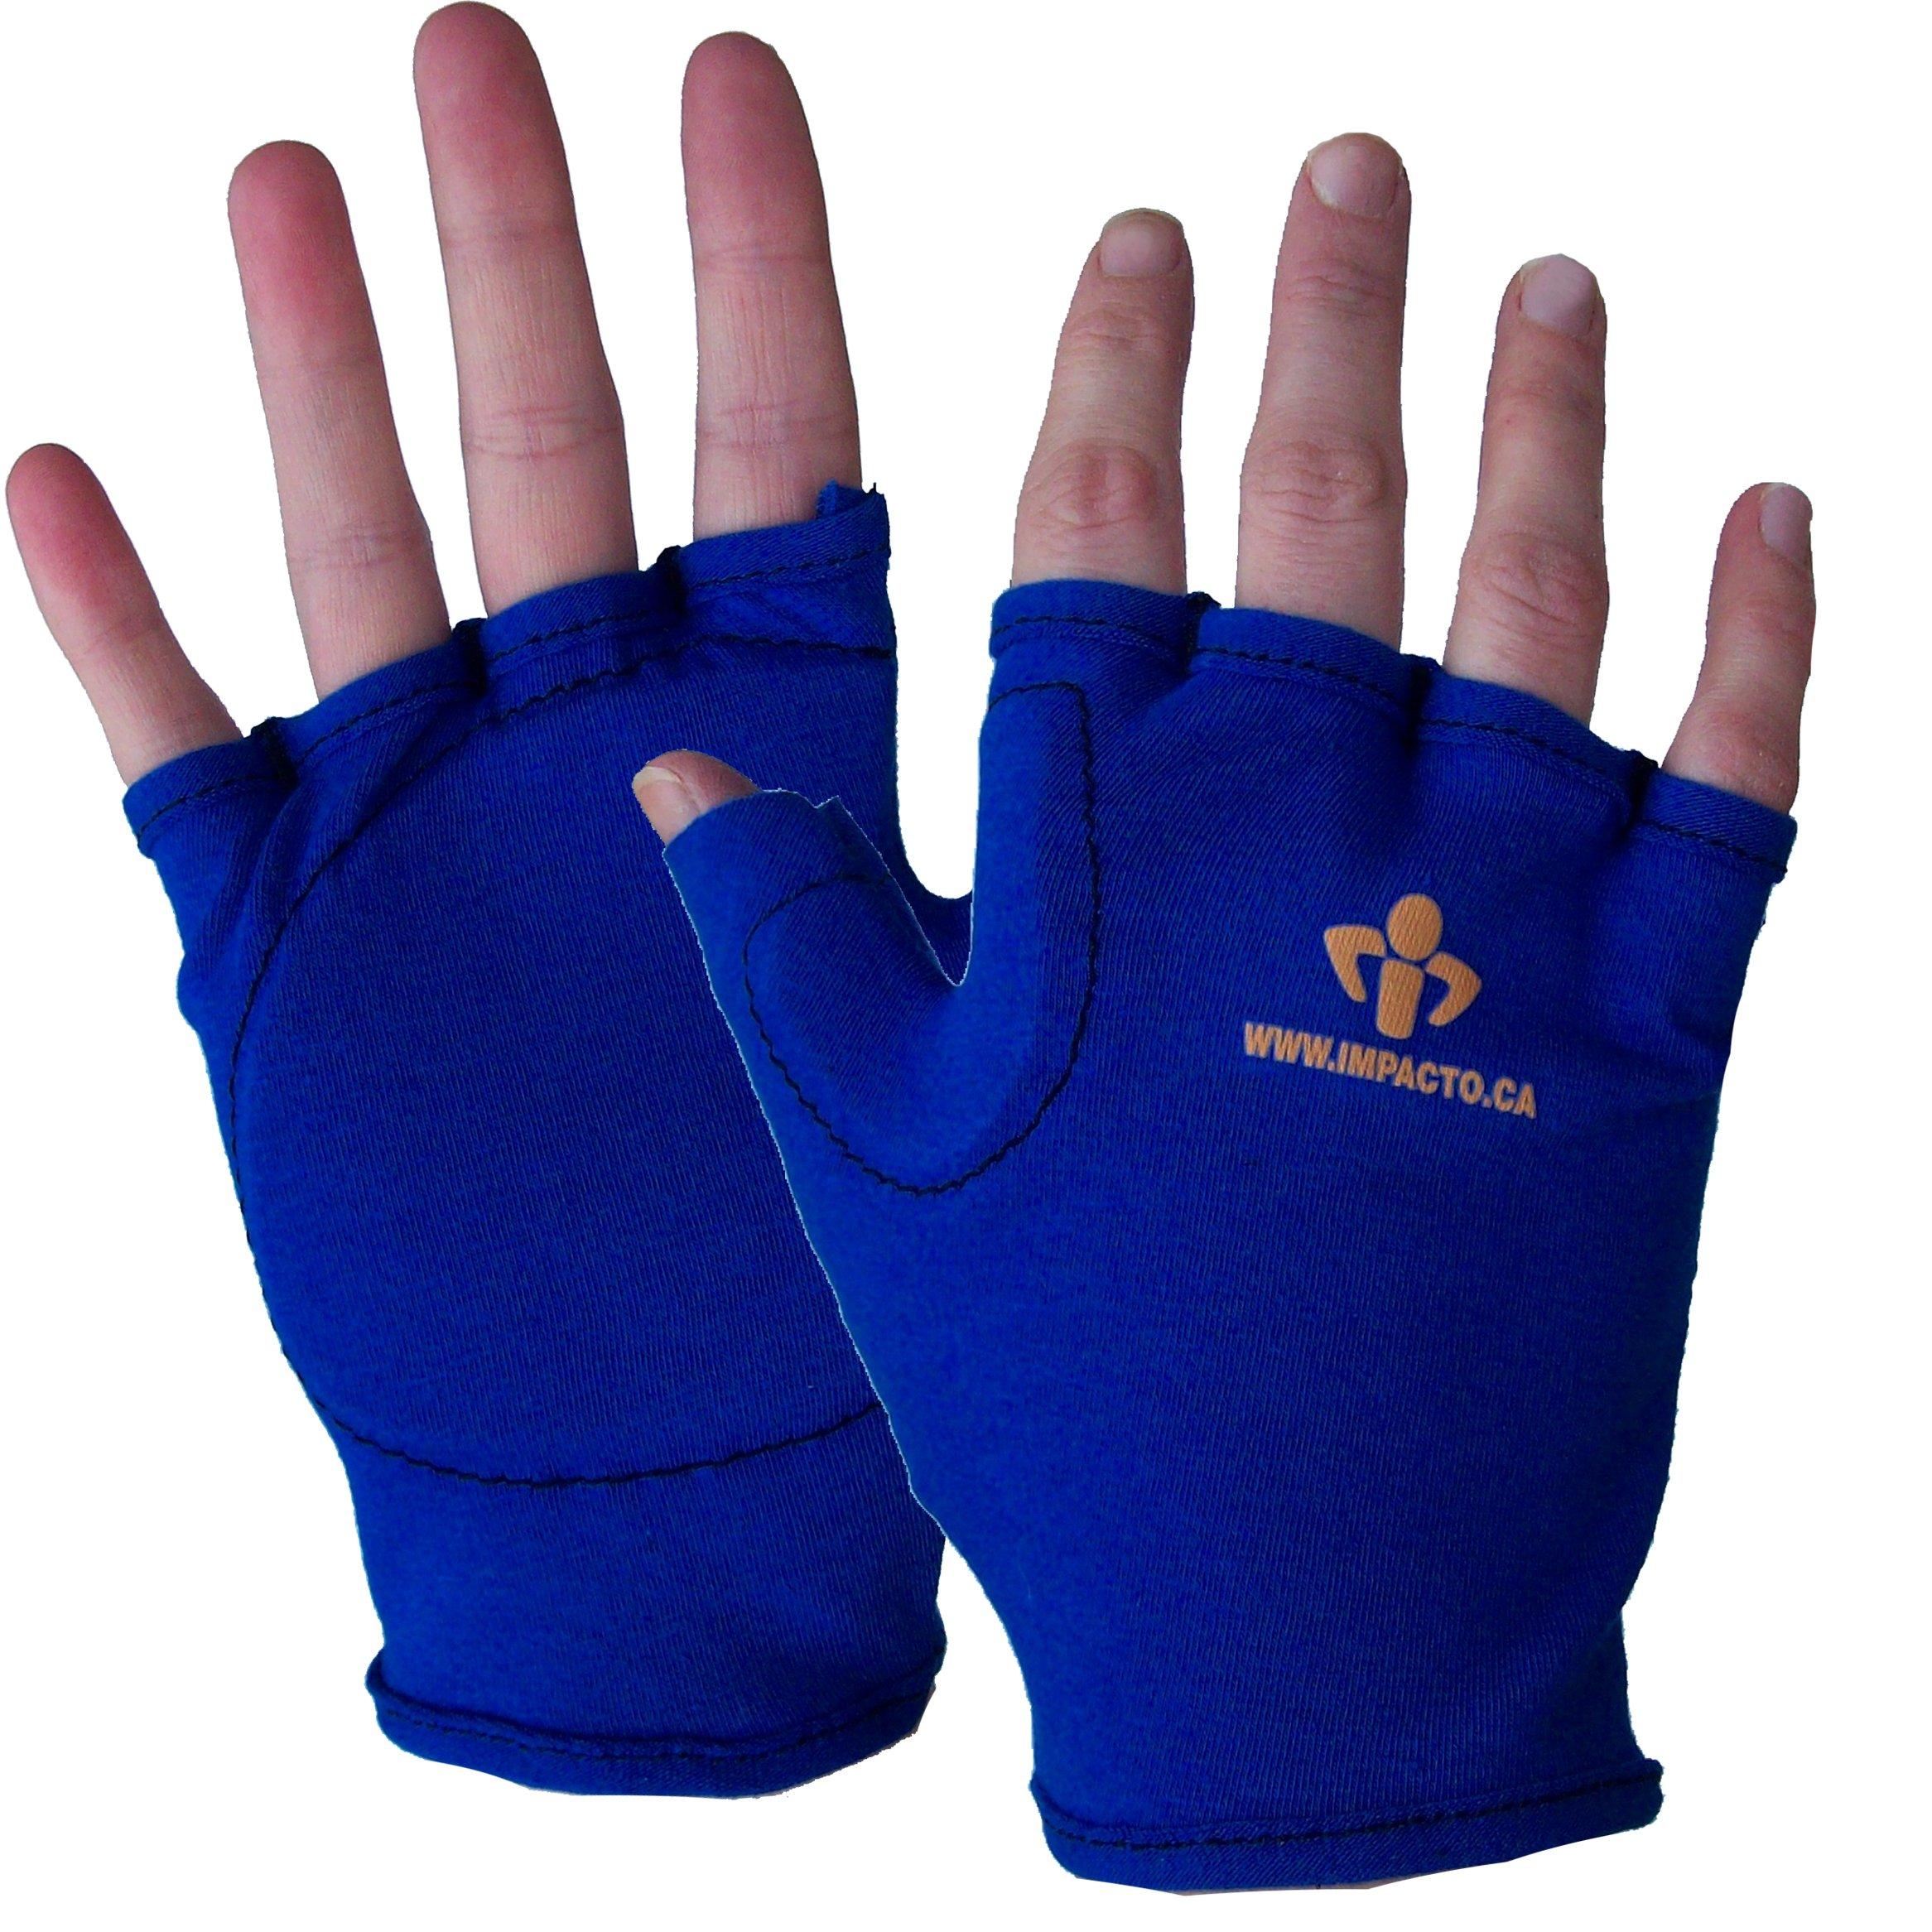 Impacto 50200120050 Anti-Impact Liner Glove, Blue by Impacto